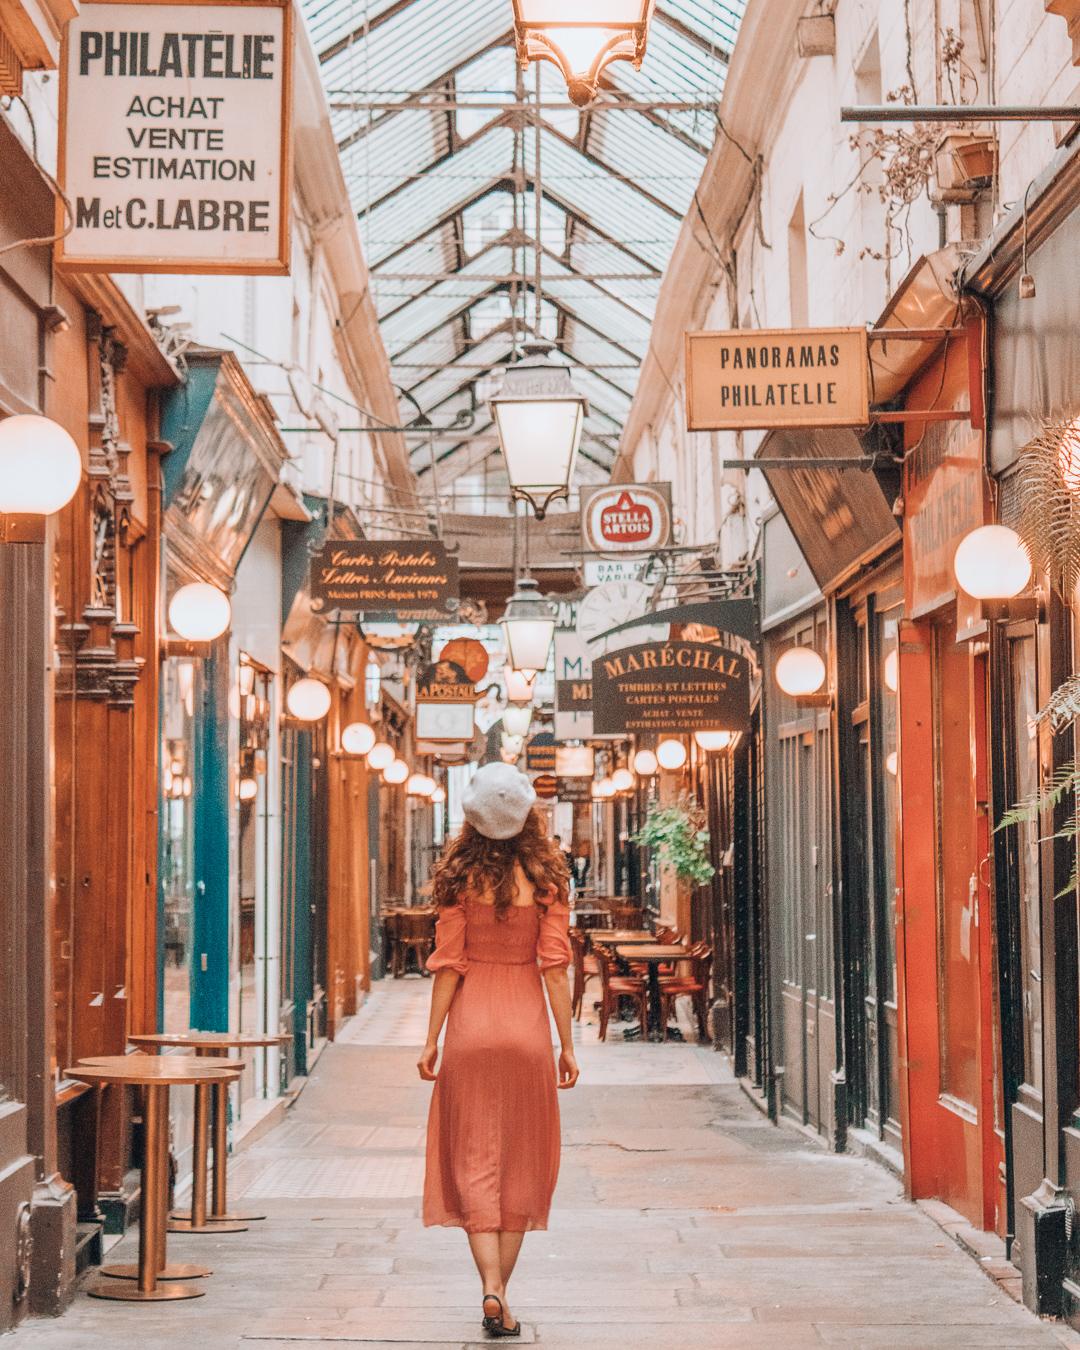 Girl in Passage des Panoramas in Paris